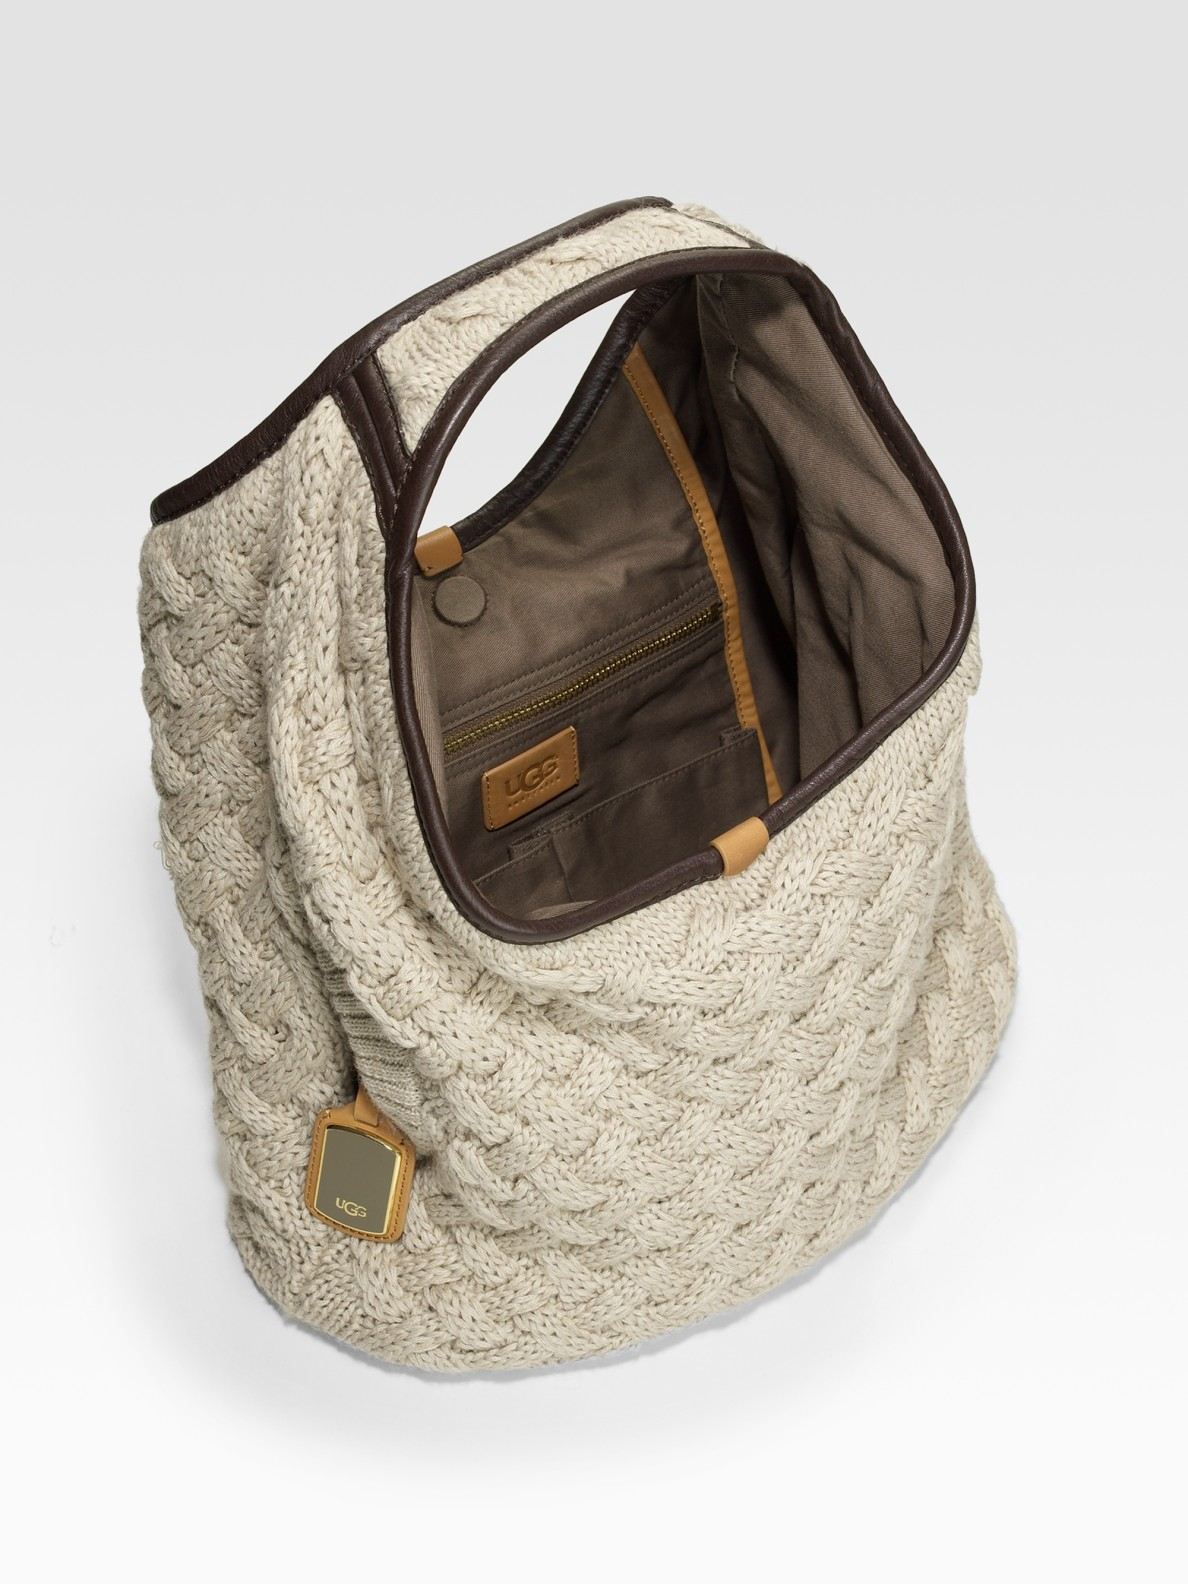 Knitting Pattern Hobo Bag : Ugg Knit Wool Hobo Bag in Beige Lyst